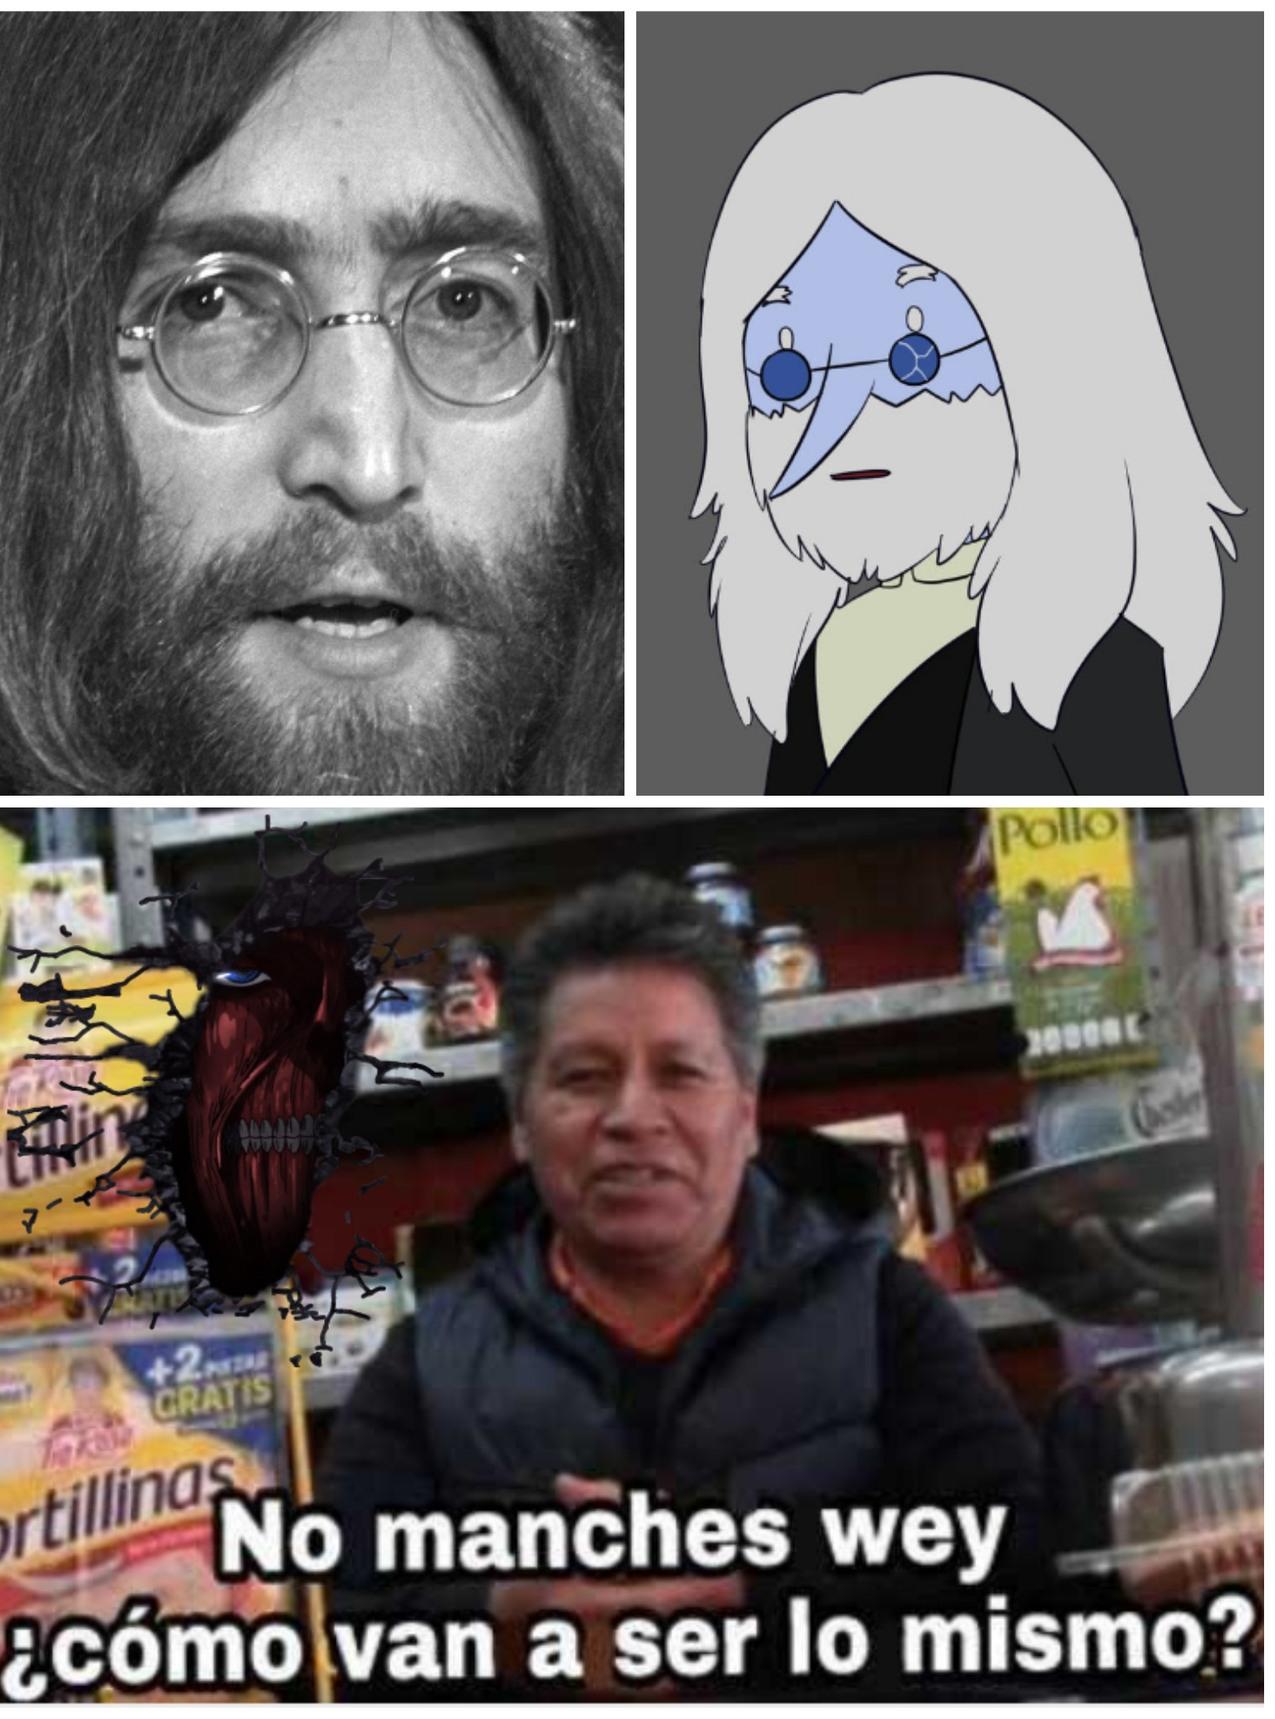 Jhon Hielo y Rey Lennon...¿o era al reves? - meme